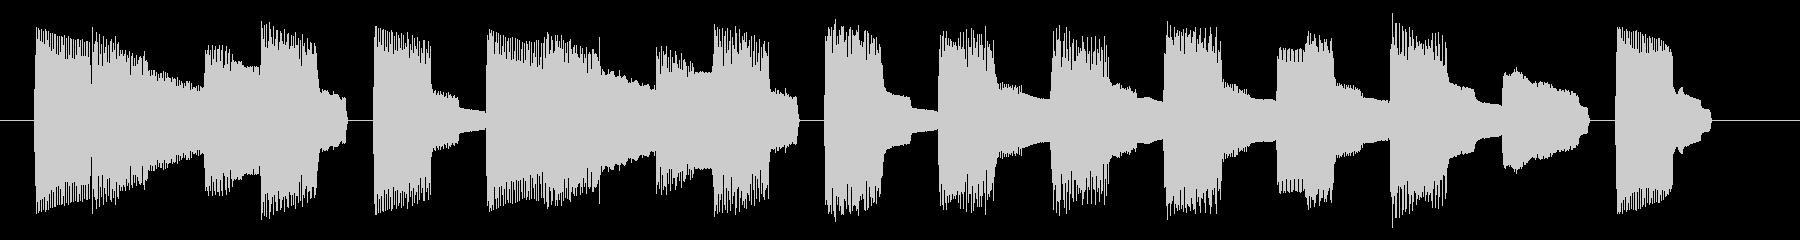 NES スポーツ A03-3(ミス1)の未再生の波形